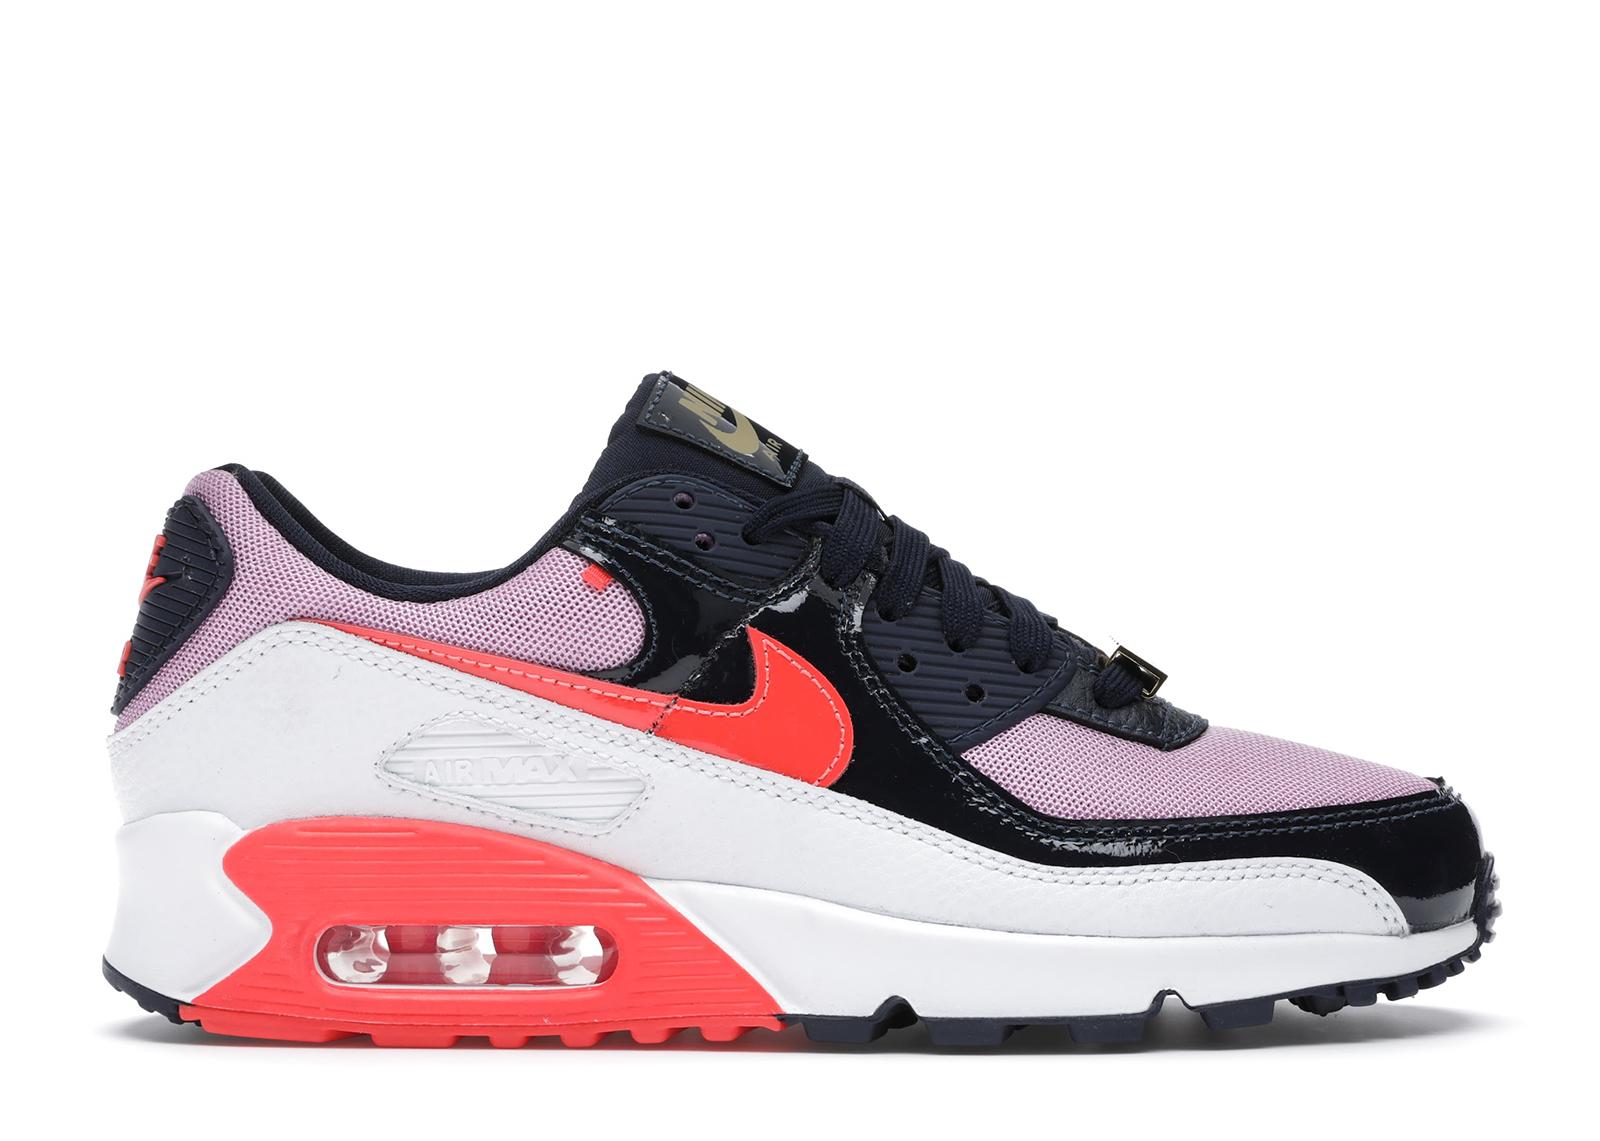 Nike Air Max 90 Cuban Link Obsidian Pink (W) - CZ8099-100